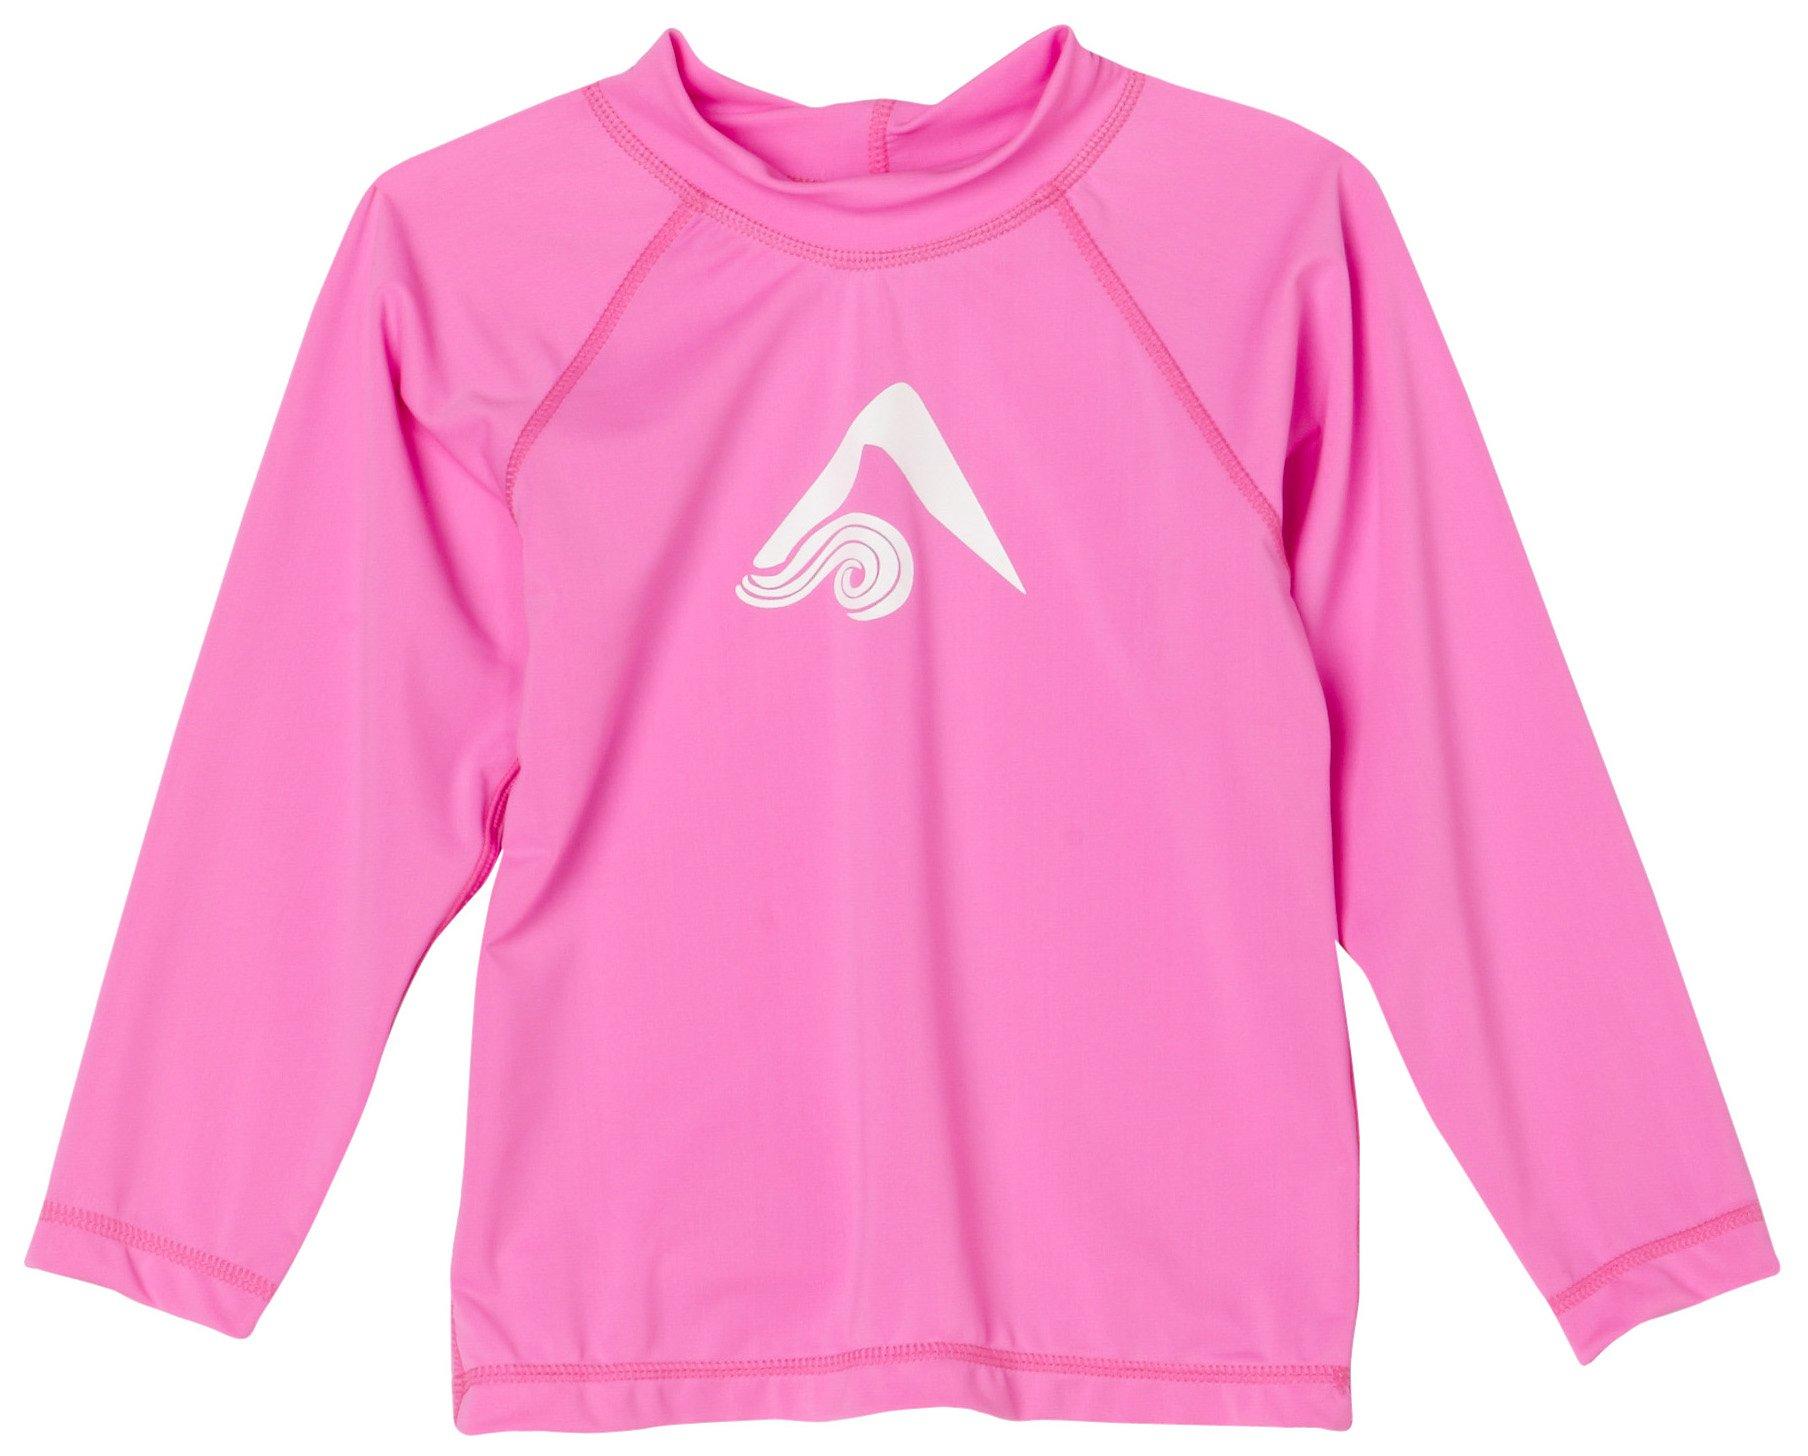 Kanu Surf Little Girls' Toddler Keri UPF 50+ Long Sleeve Rashguard, Pink, 5T